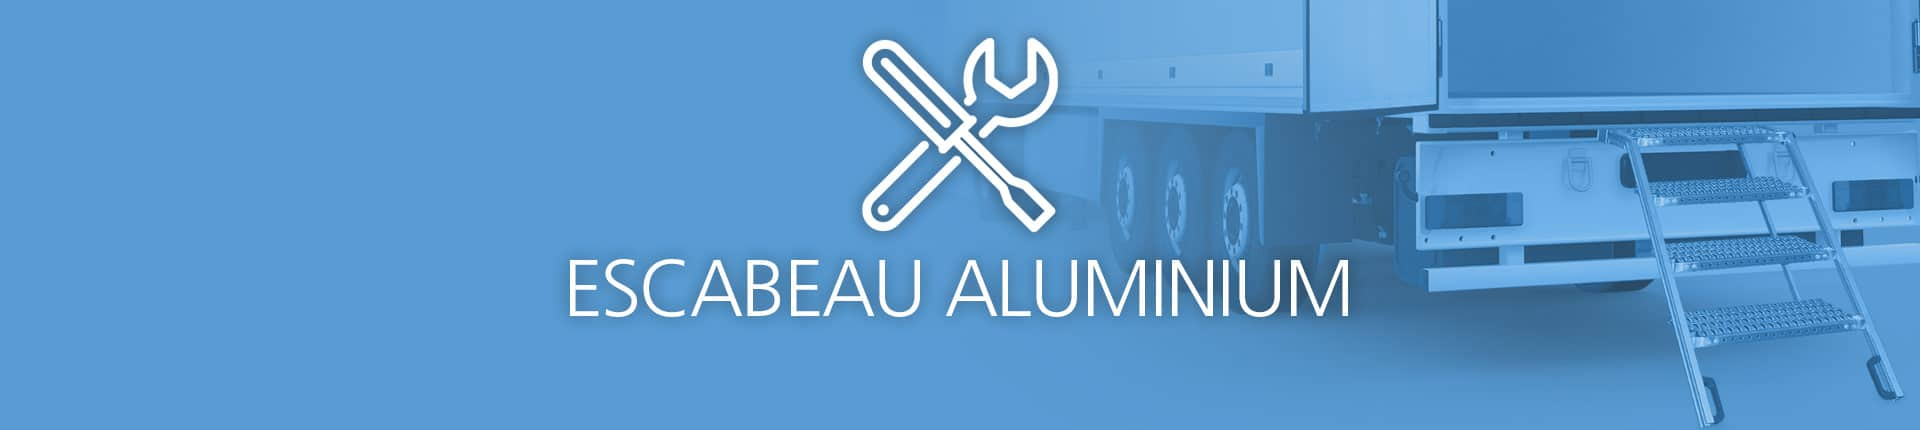 Header BFX Escabeau aluminium